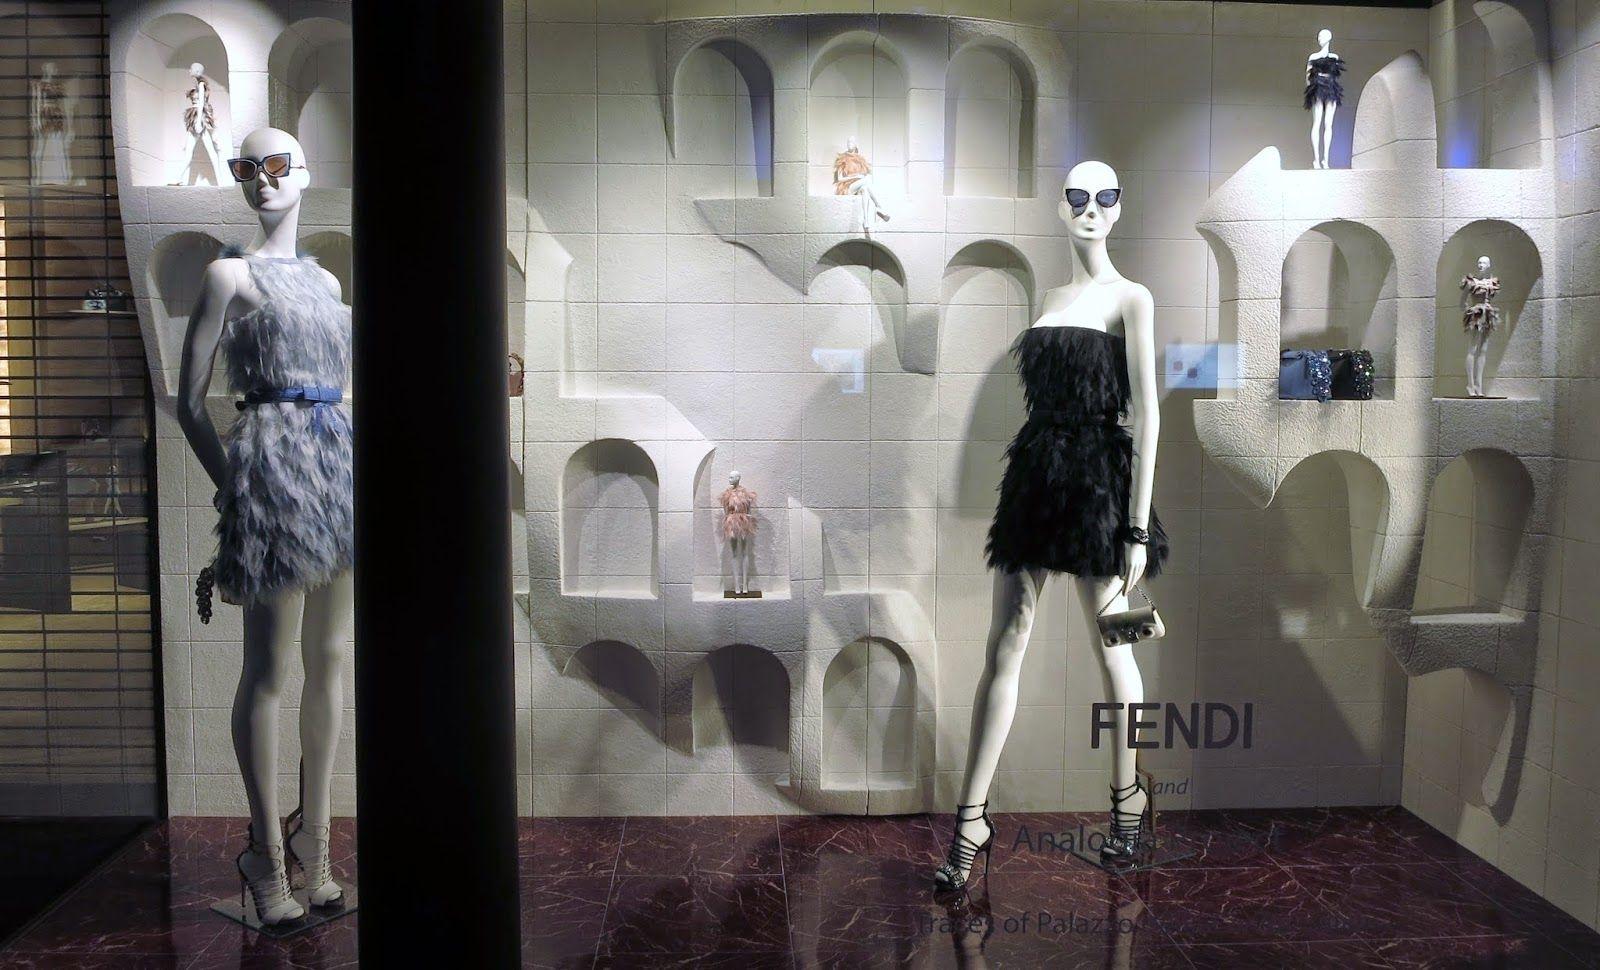 Fendi, London abril 15 #retail #windows #vitrines #vitrinas #escaparates #visualmerchandising Pineado por Pilar Escolano